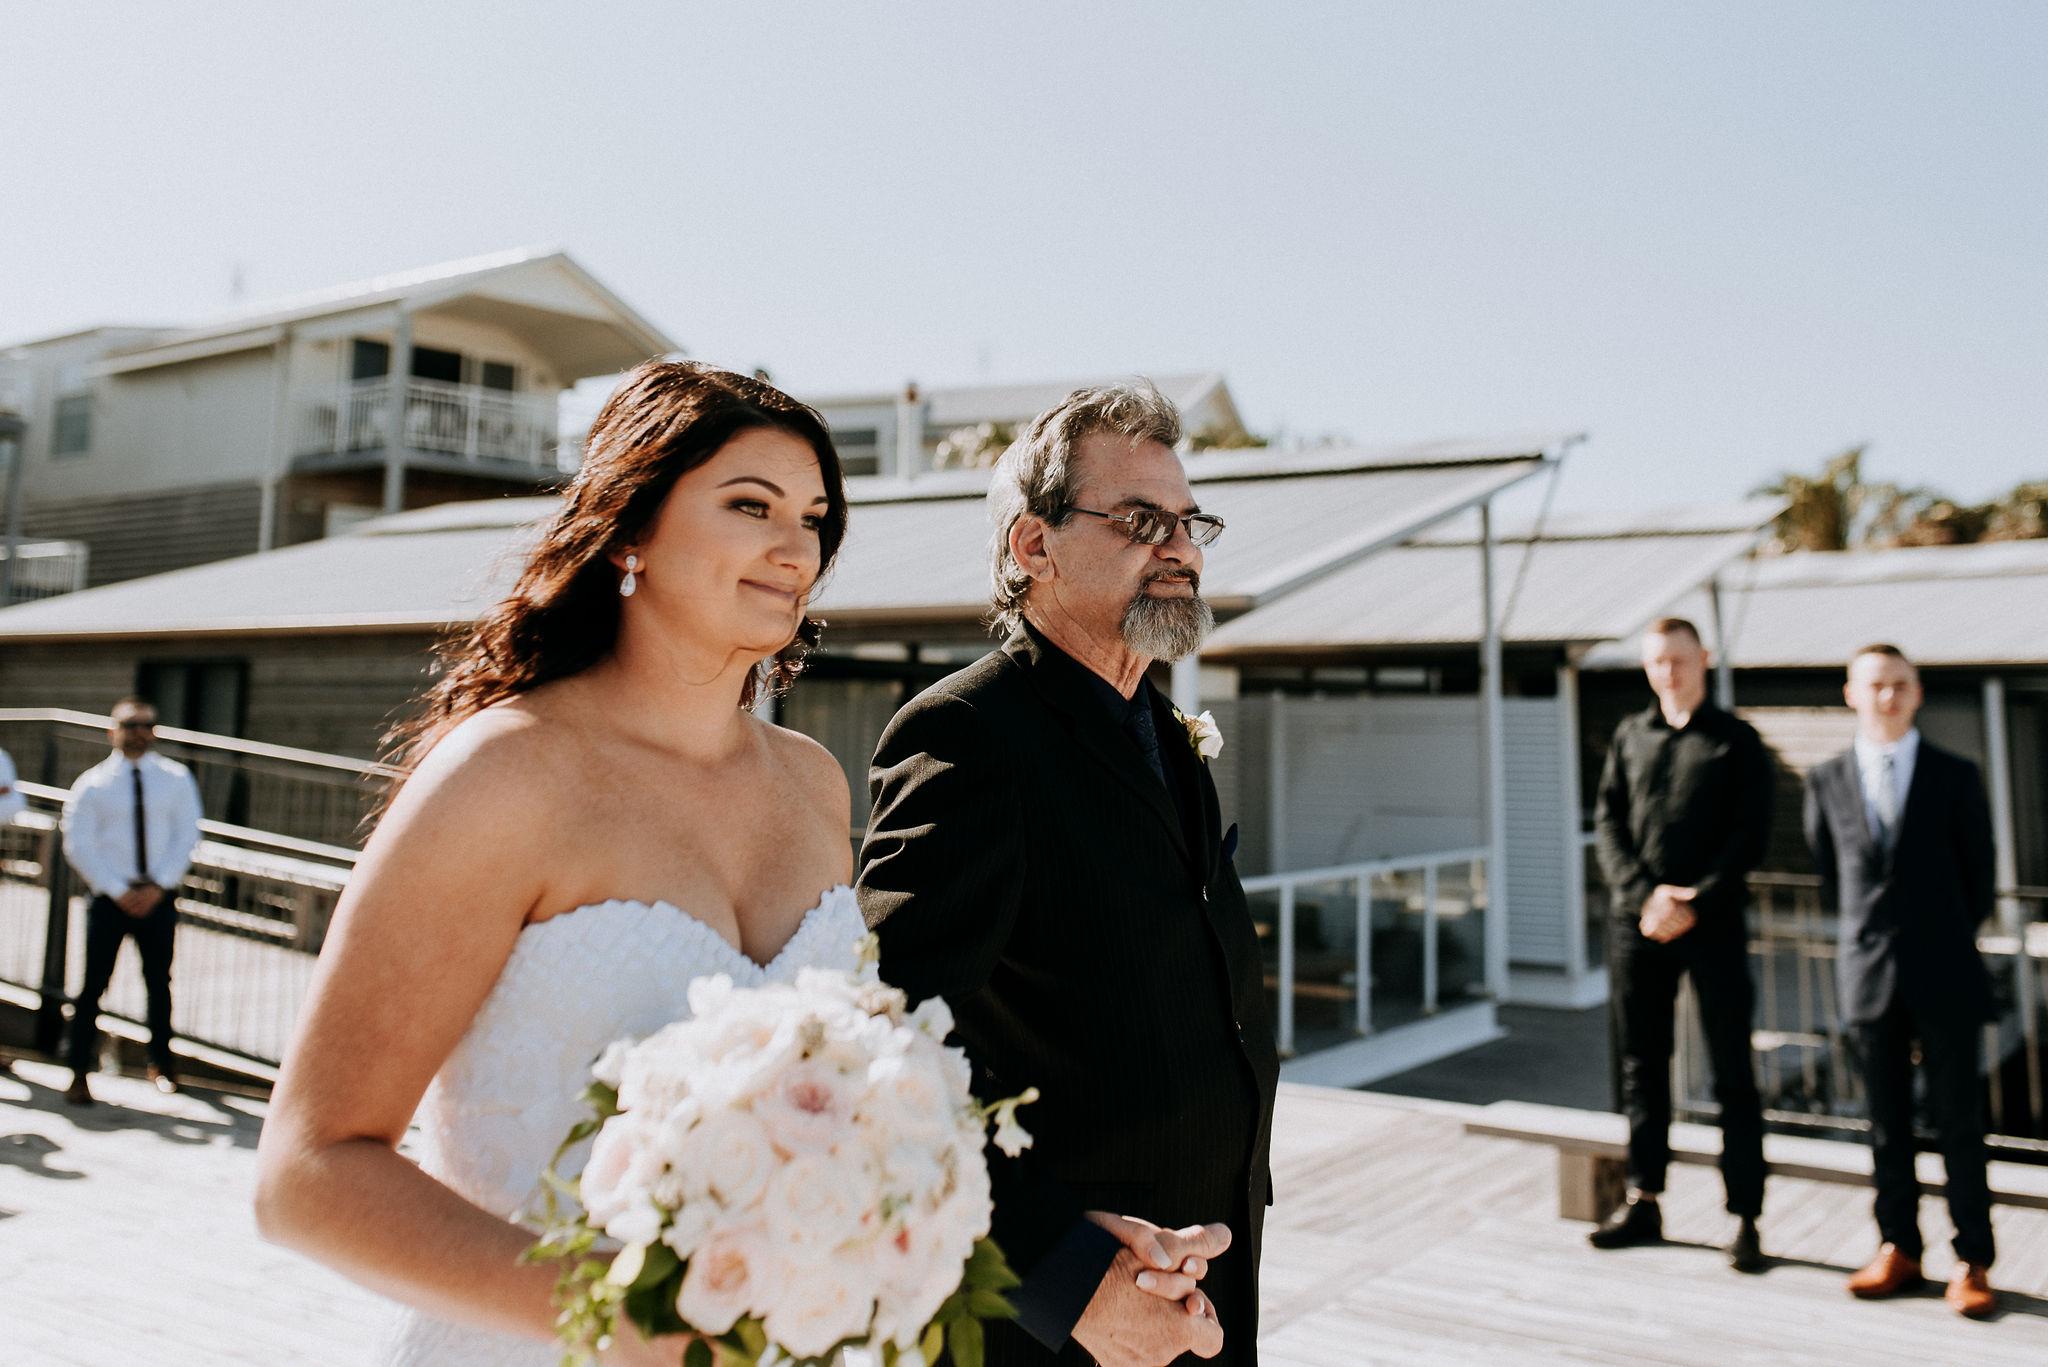 CAVES-BEACH-HOTEL-WEDDING-PATTEN-388.jpg